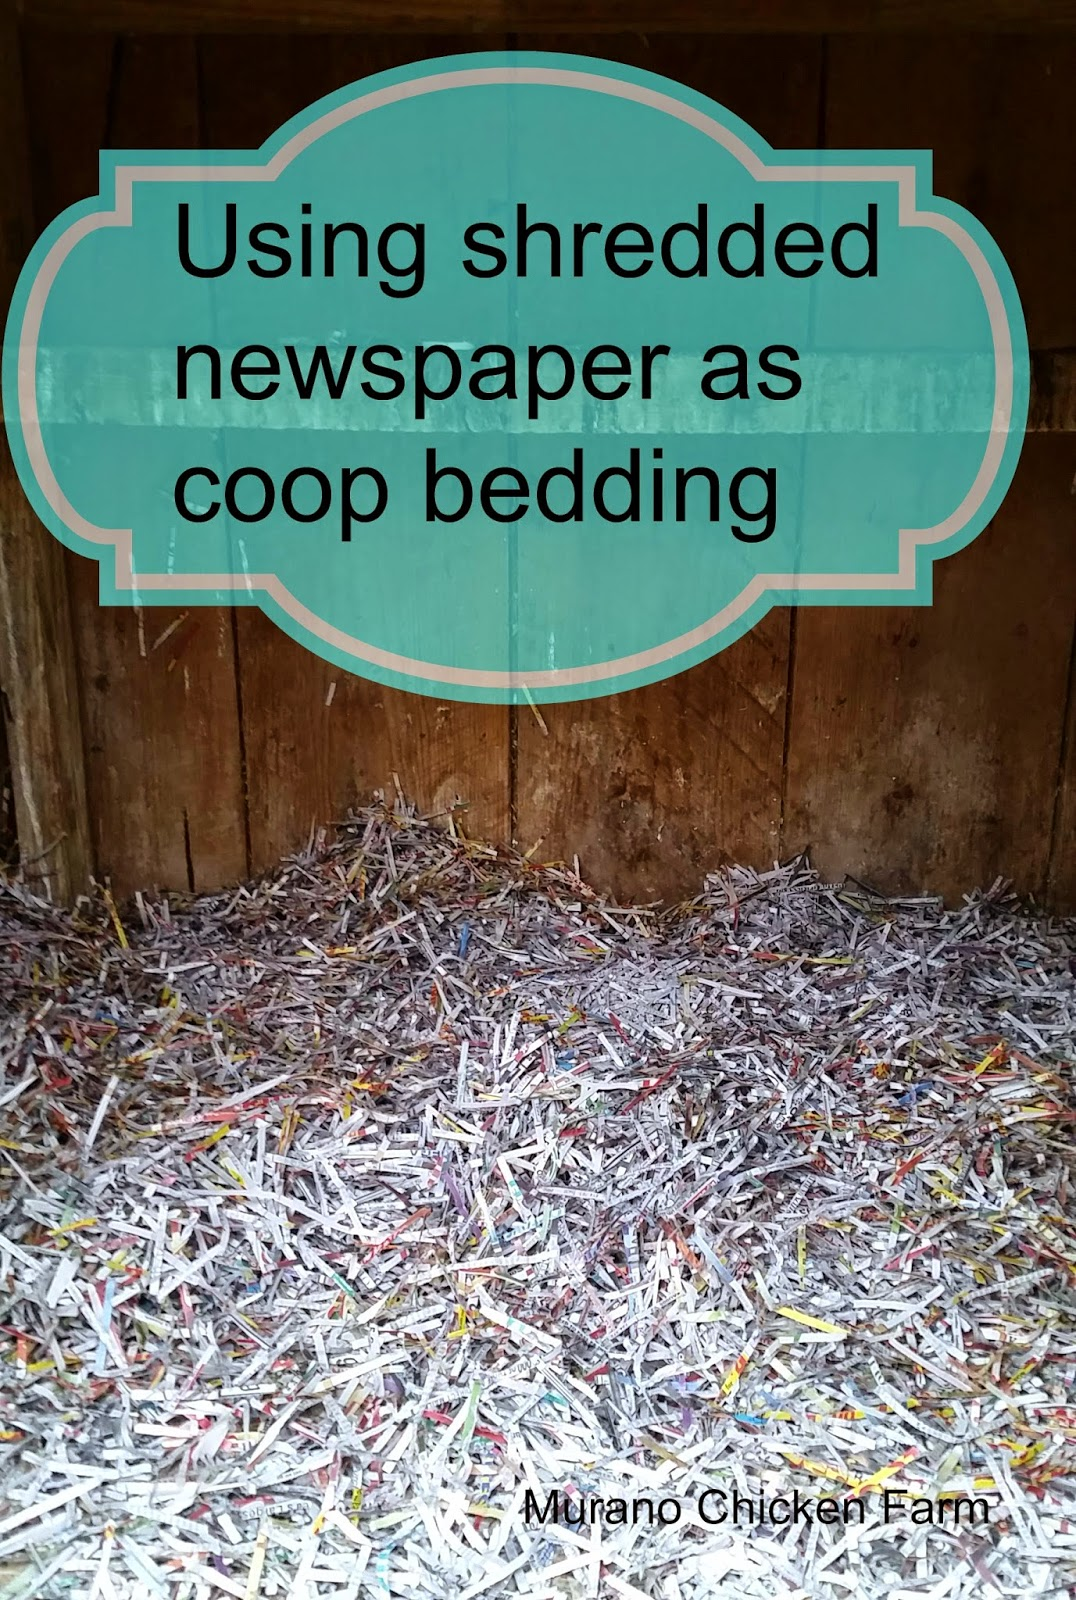 chicken coop bedding, shredded paper